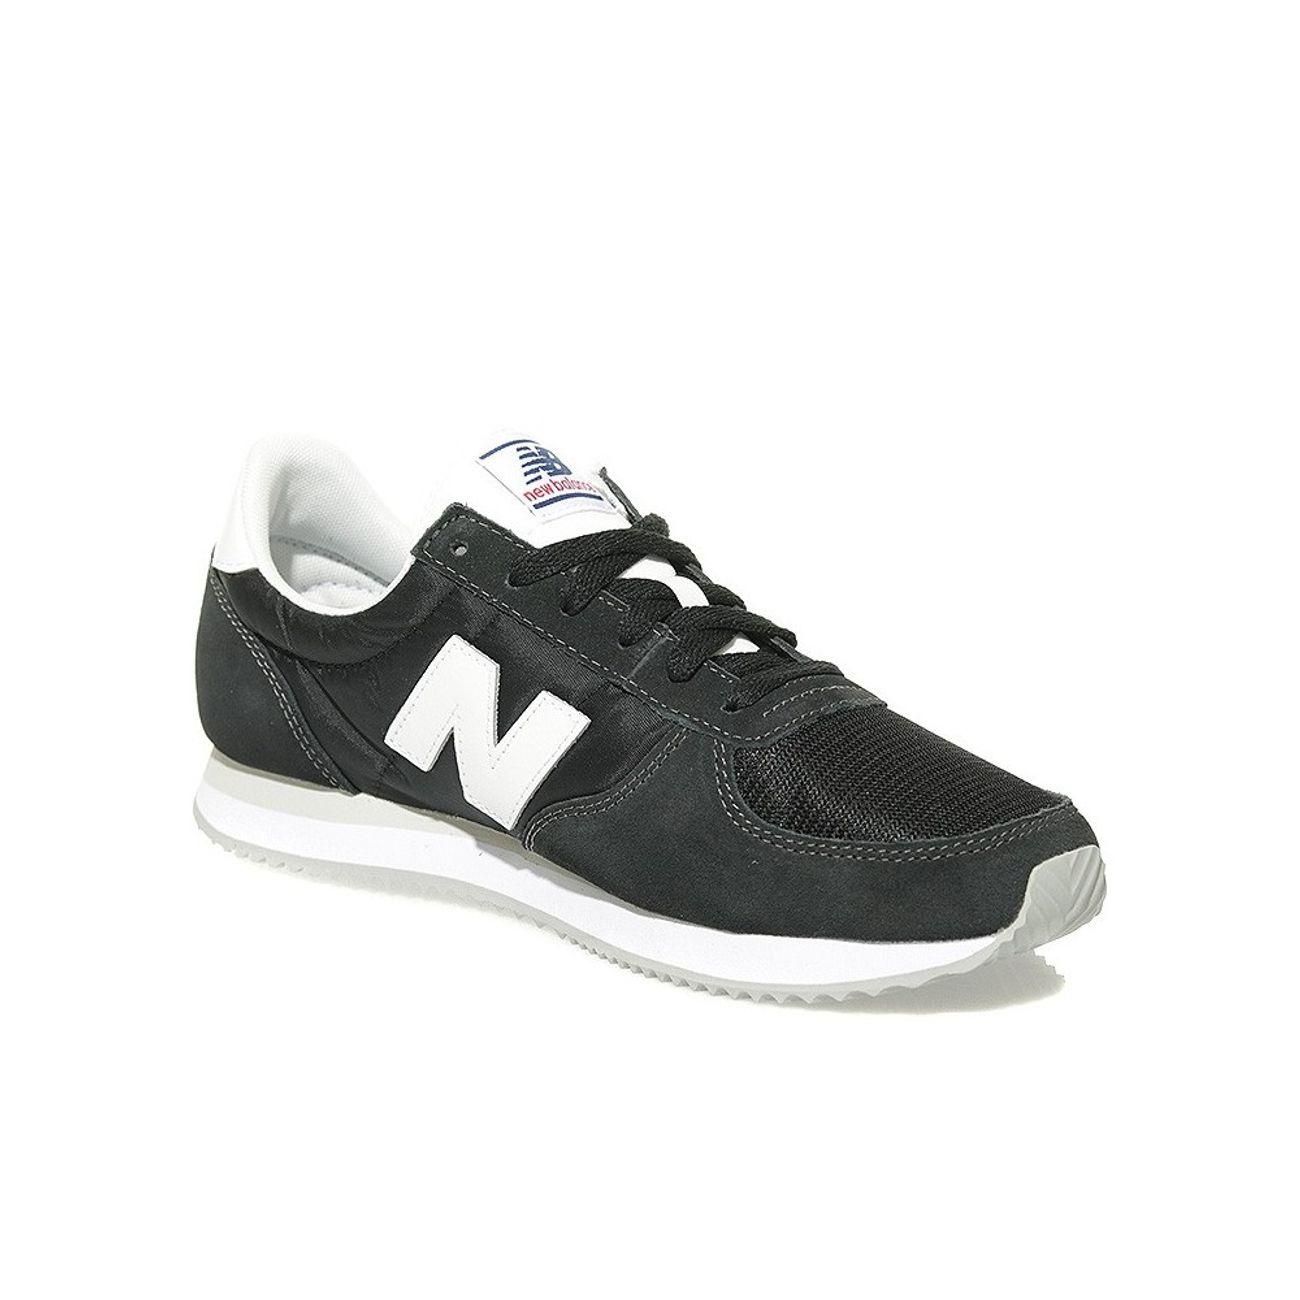 Chaussures New Balance U 220 Vintage noir blanc – achat et